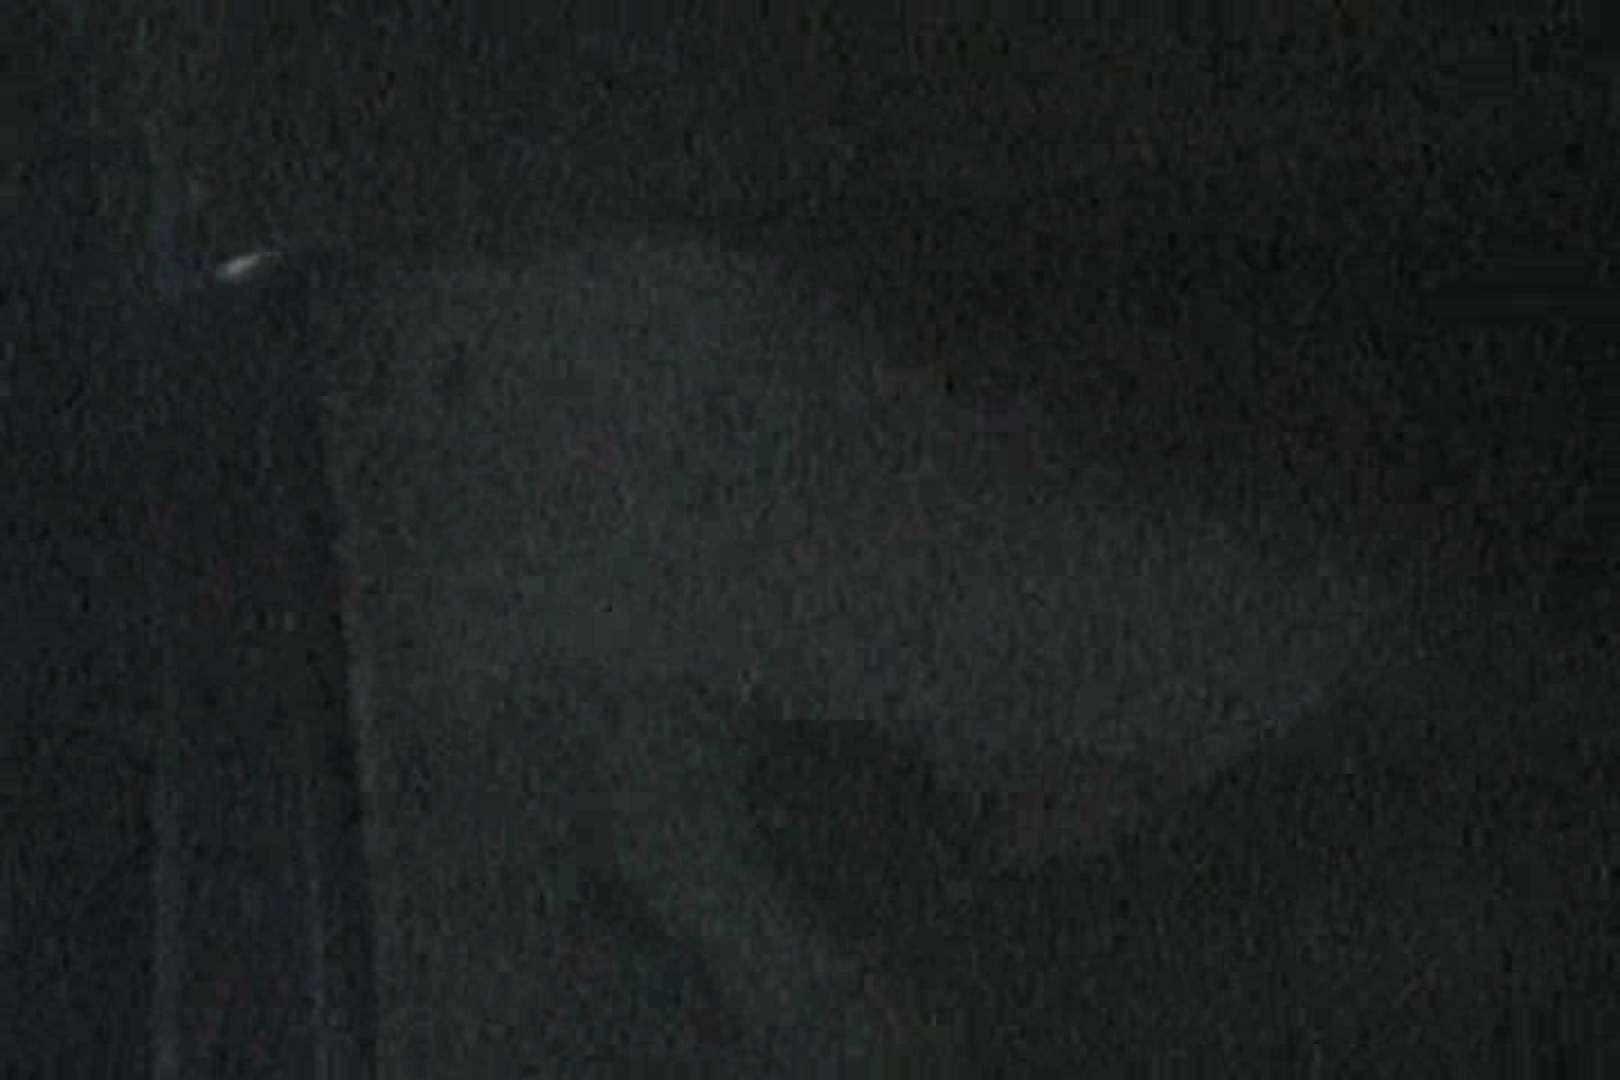 充血監督の深夜の運動会Vol.7 接写  98画像 42